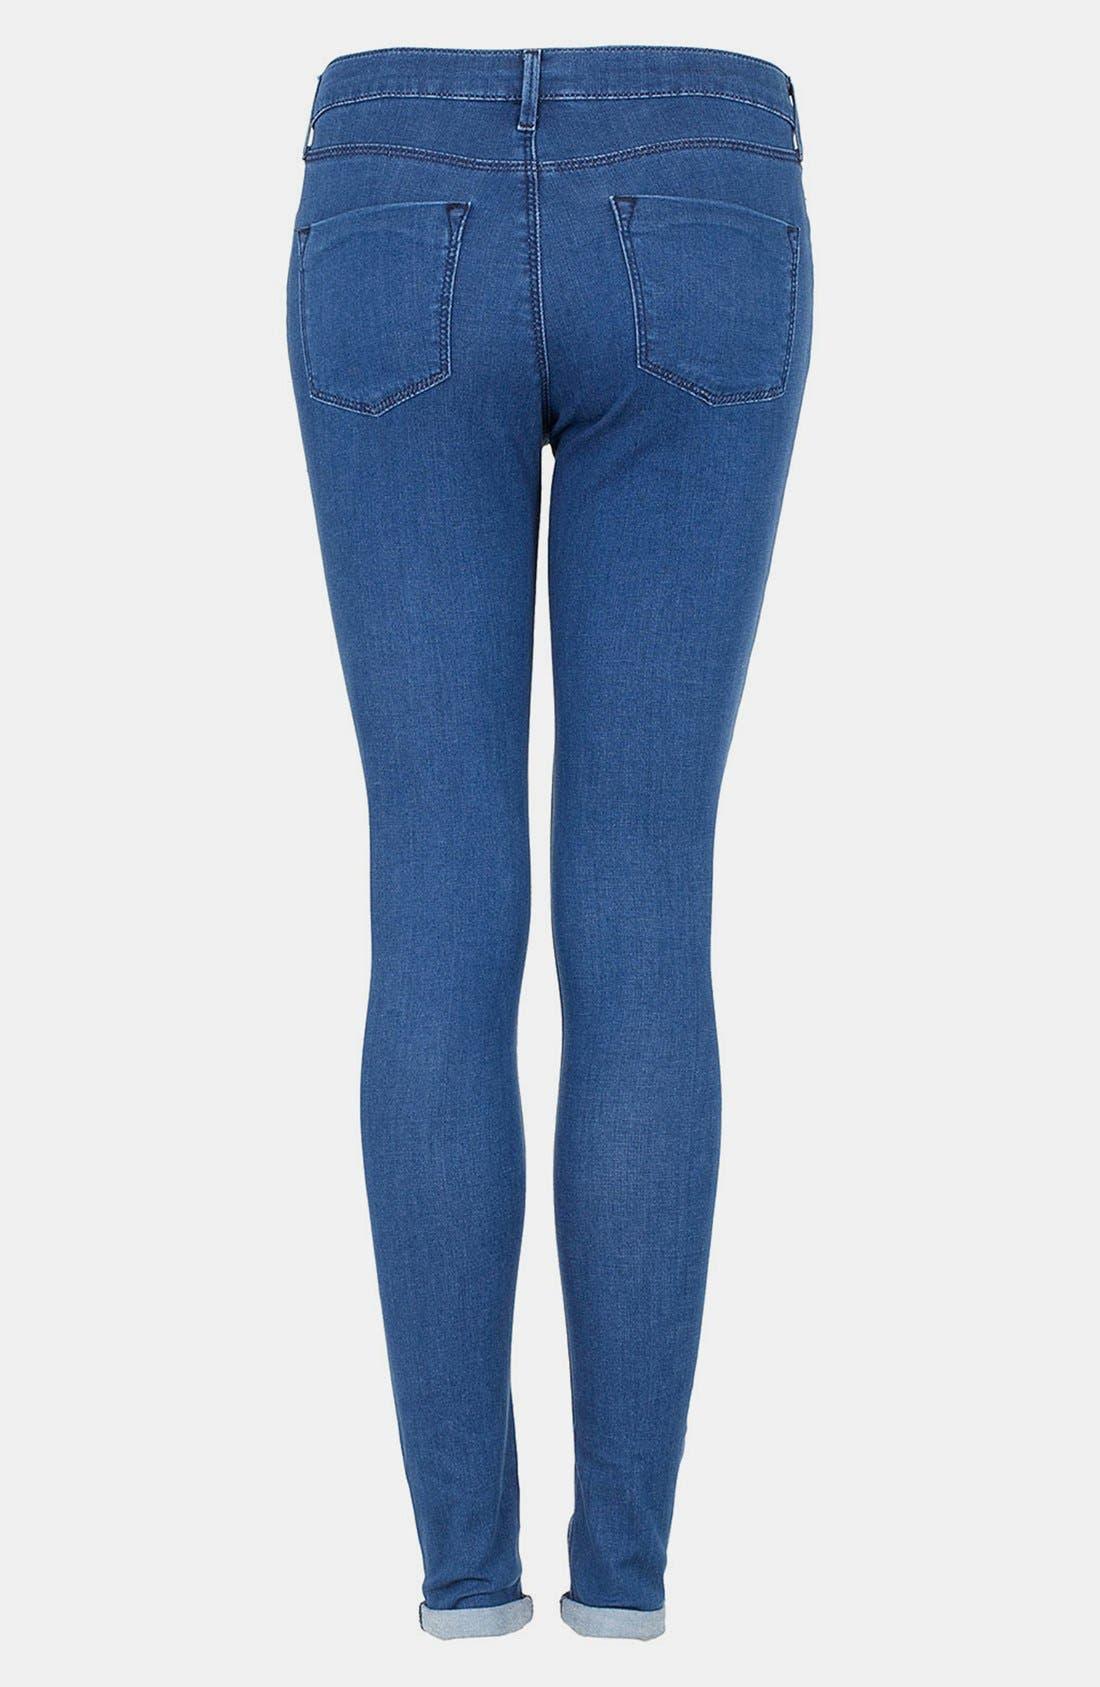 Alternate Image 2  - Topshop Moto 'Leigh' Skinny Jeans (Blue) (Short)